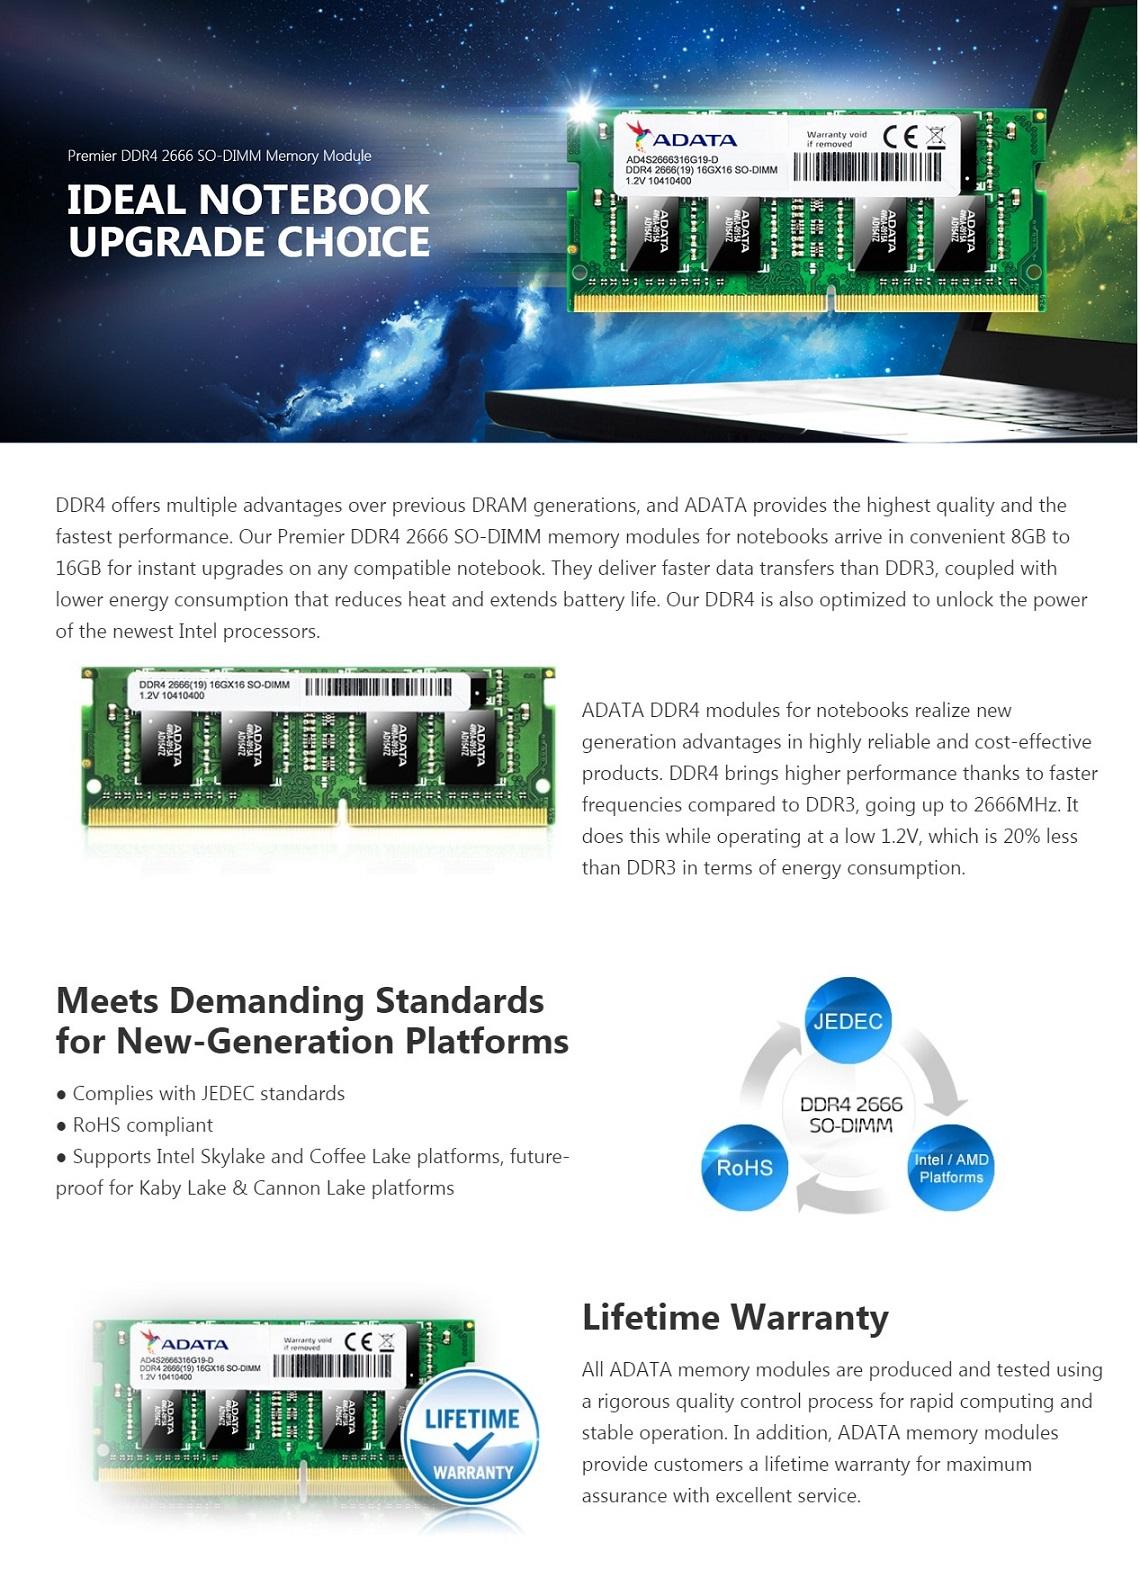 Adata 16GB Premier DDR4 2666Mhz 1.2v 260-pin SO-DIMM Memory Module Laptop Memory